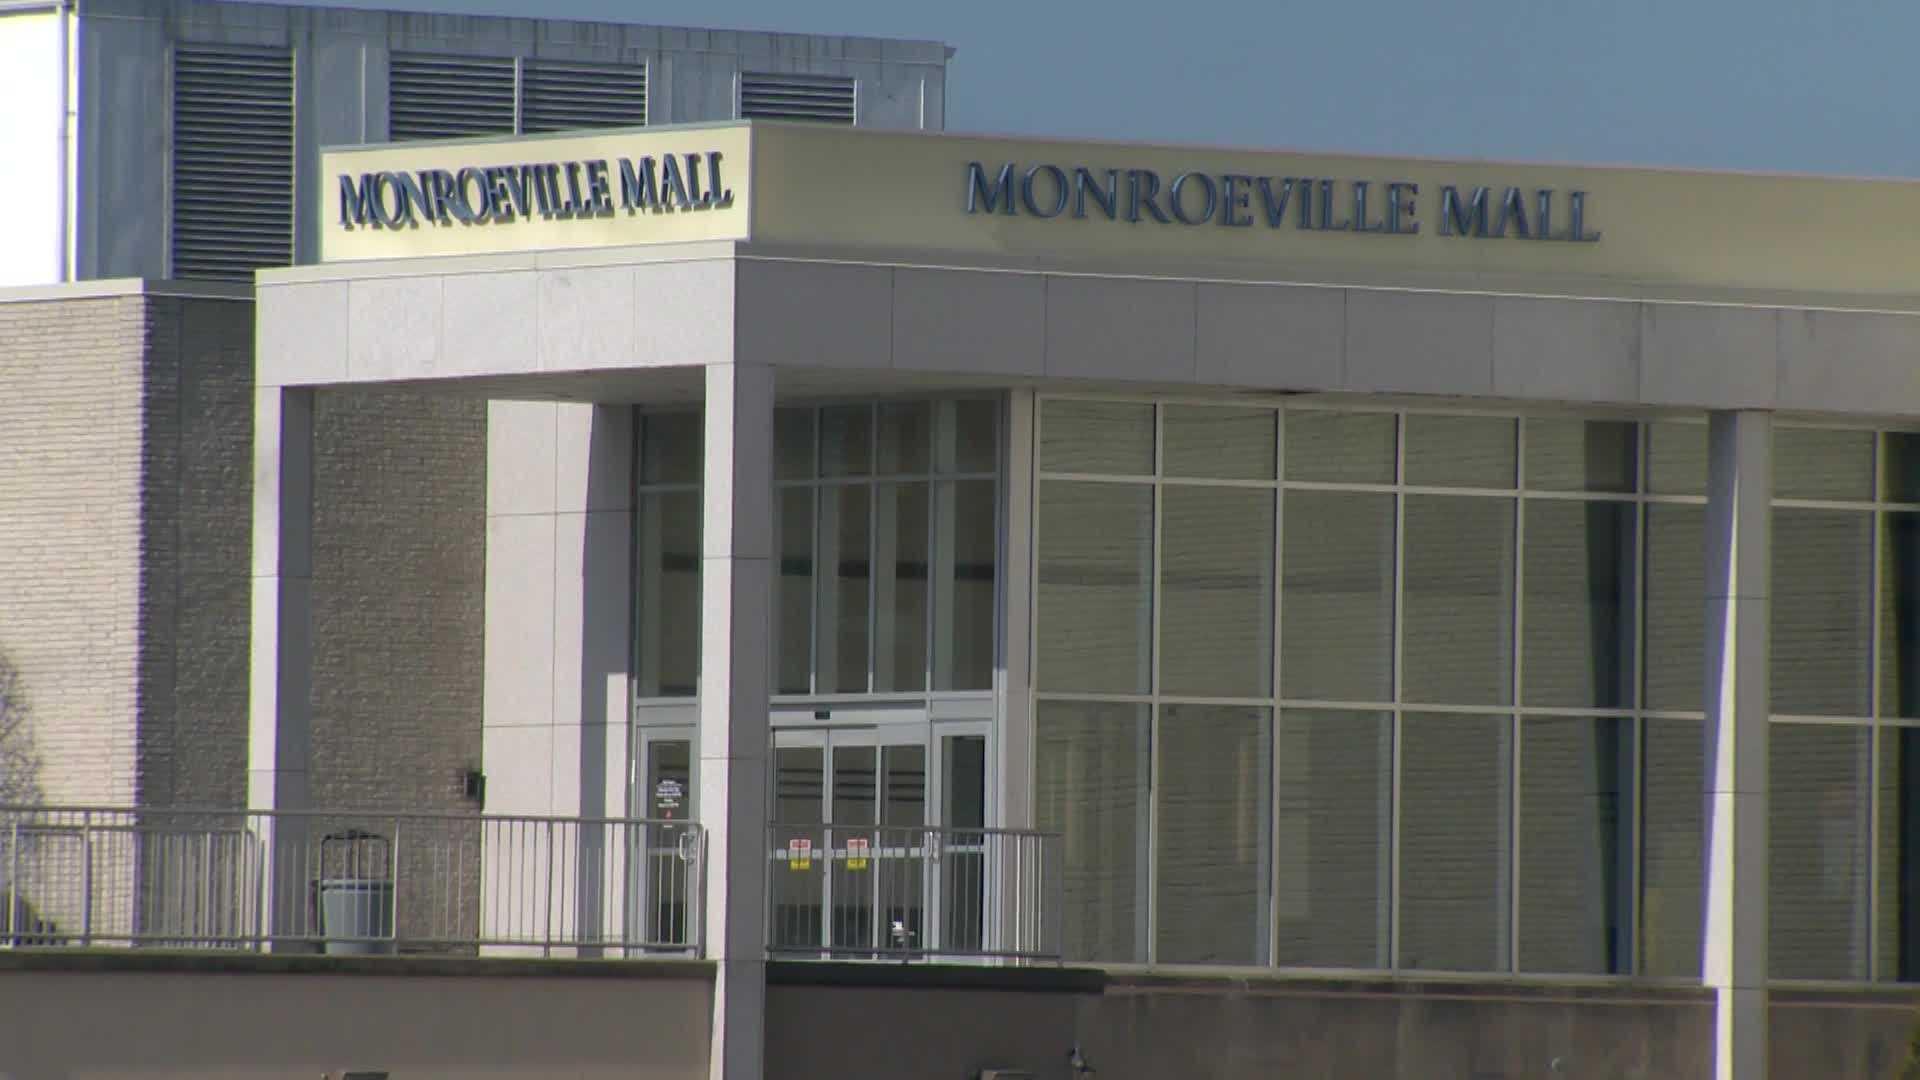 Monroeville Mall